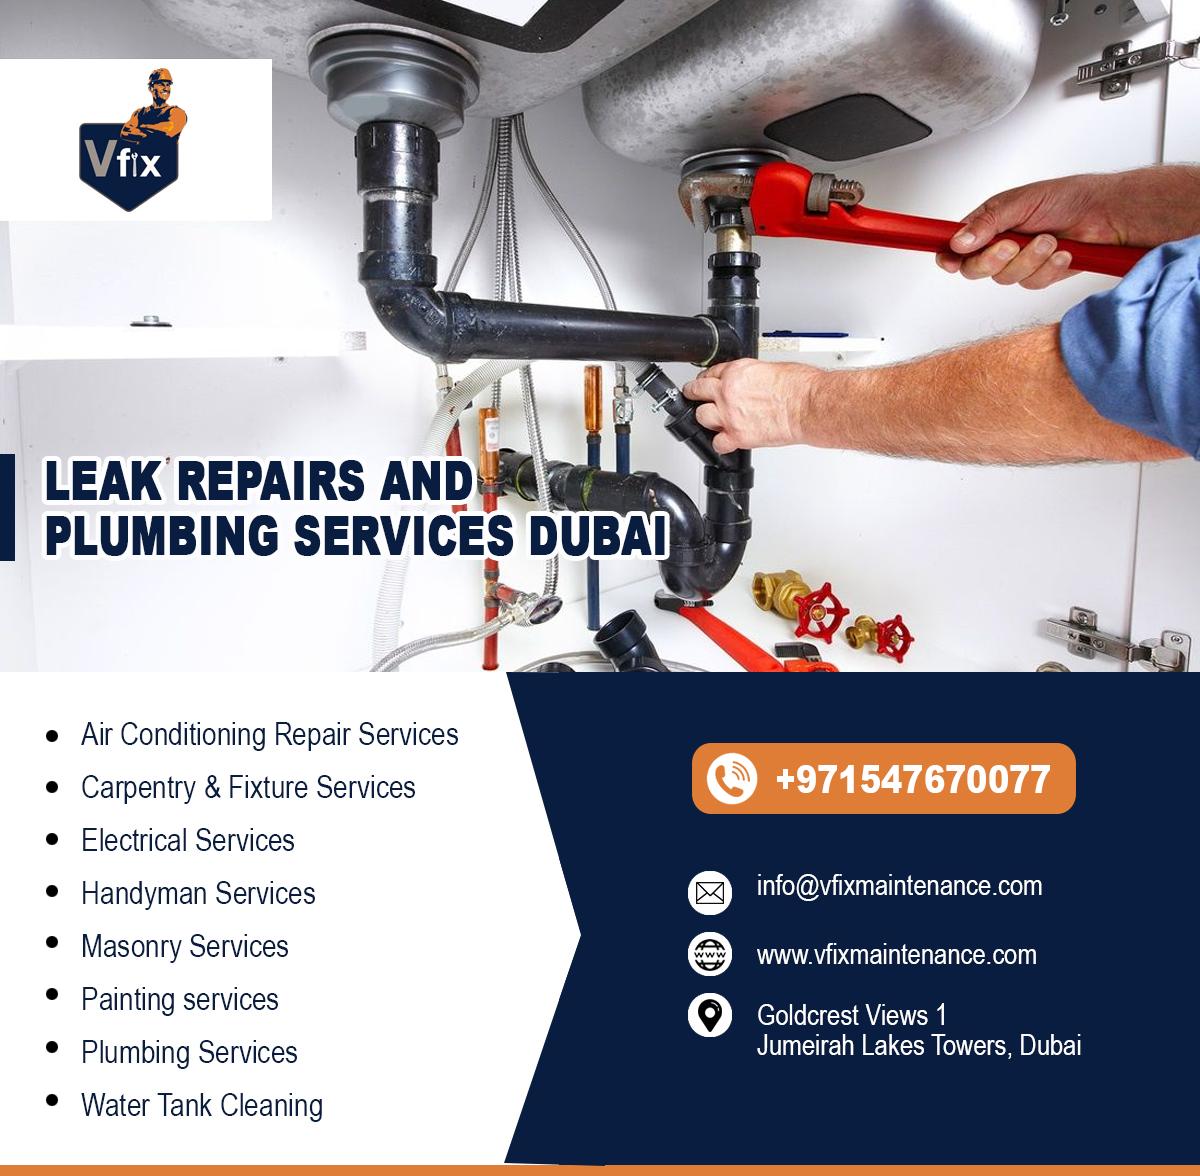 Vfix-leak-repairs-and-plumbing-services-in-dubai.jpg